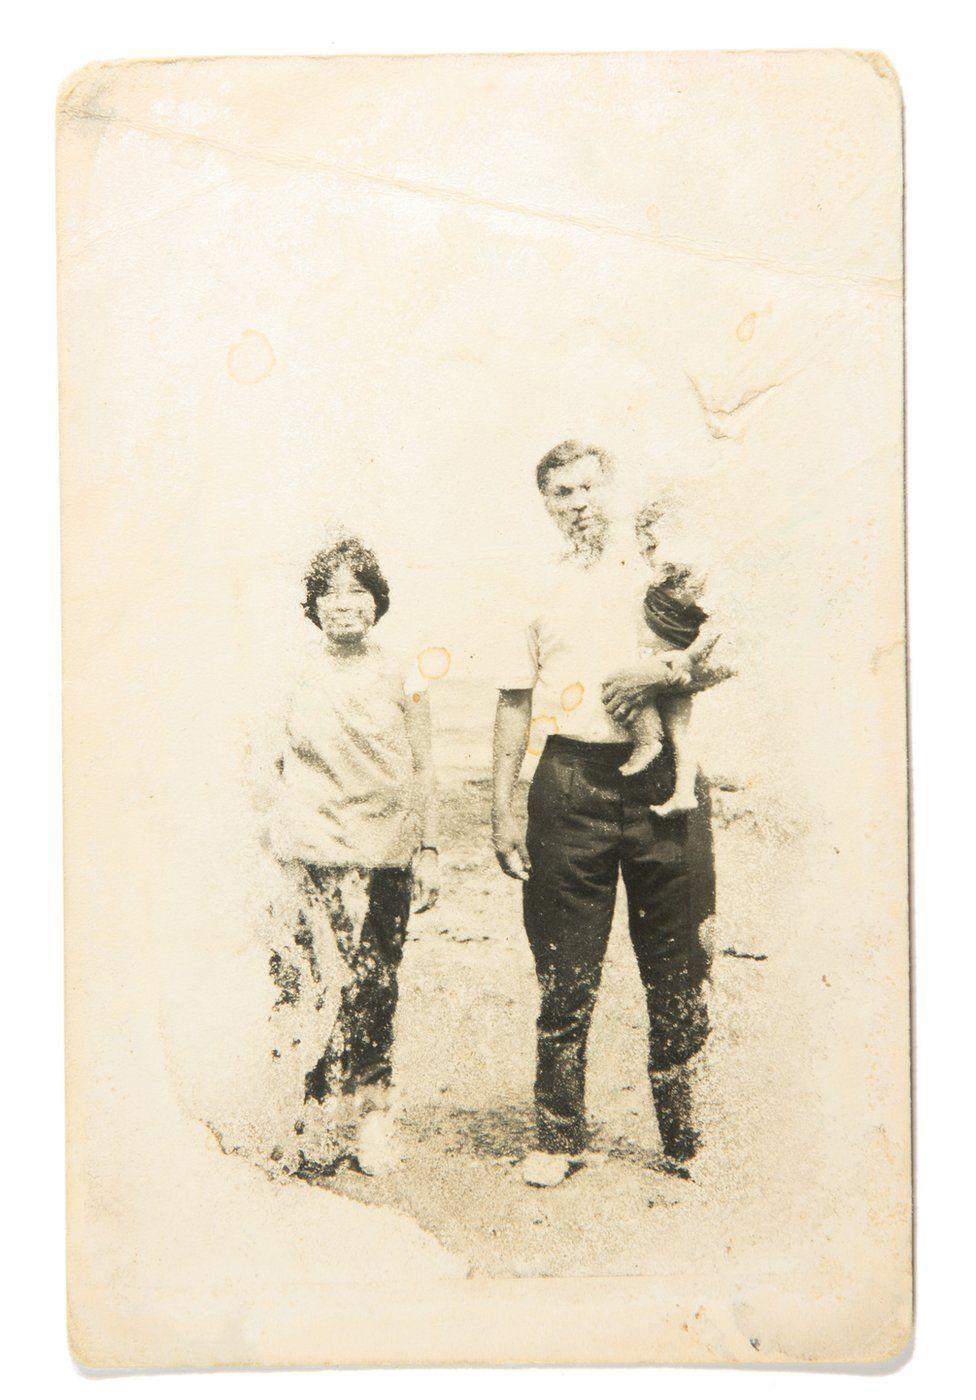 Vira and Sundaram's parents